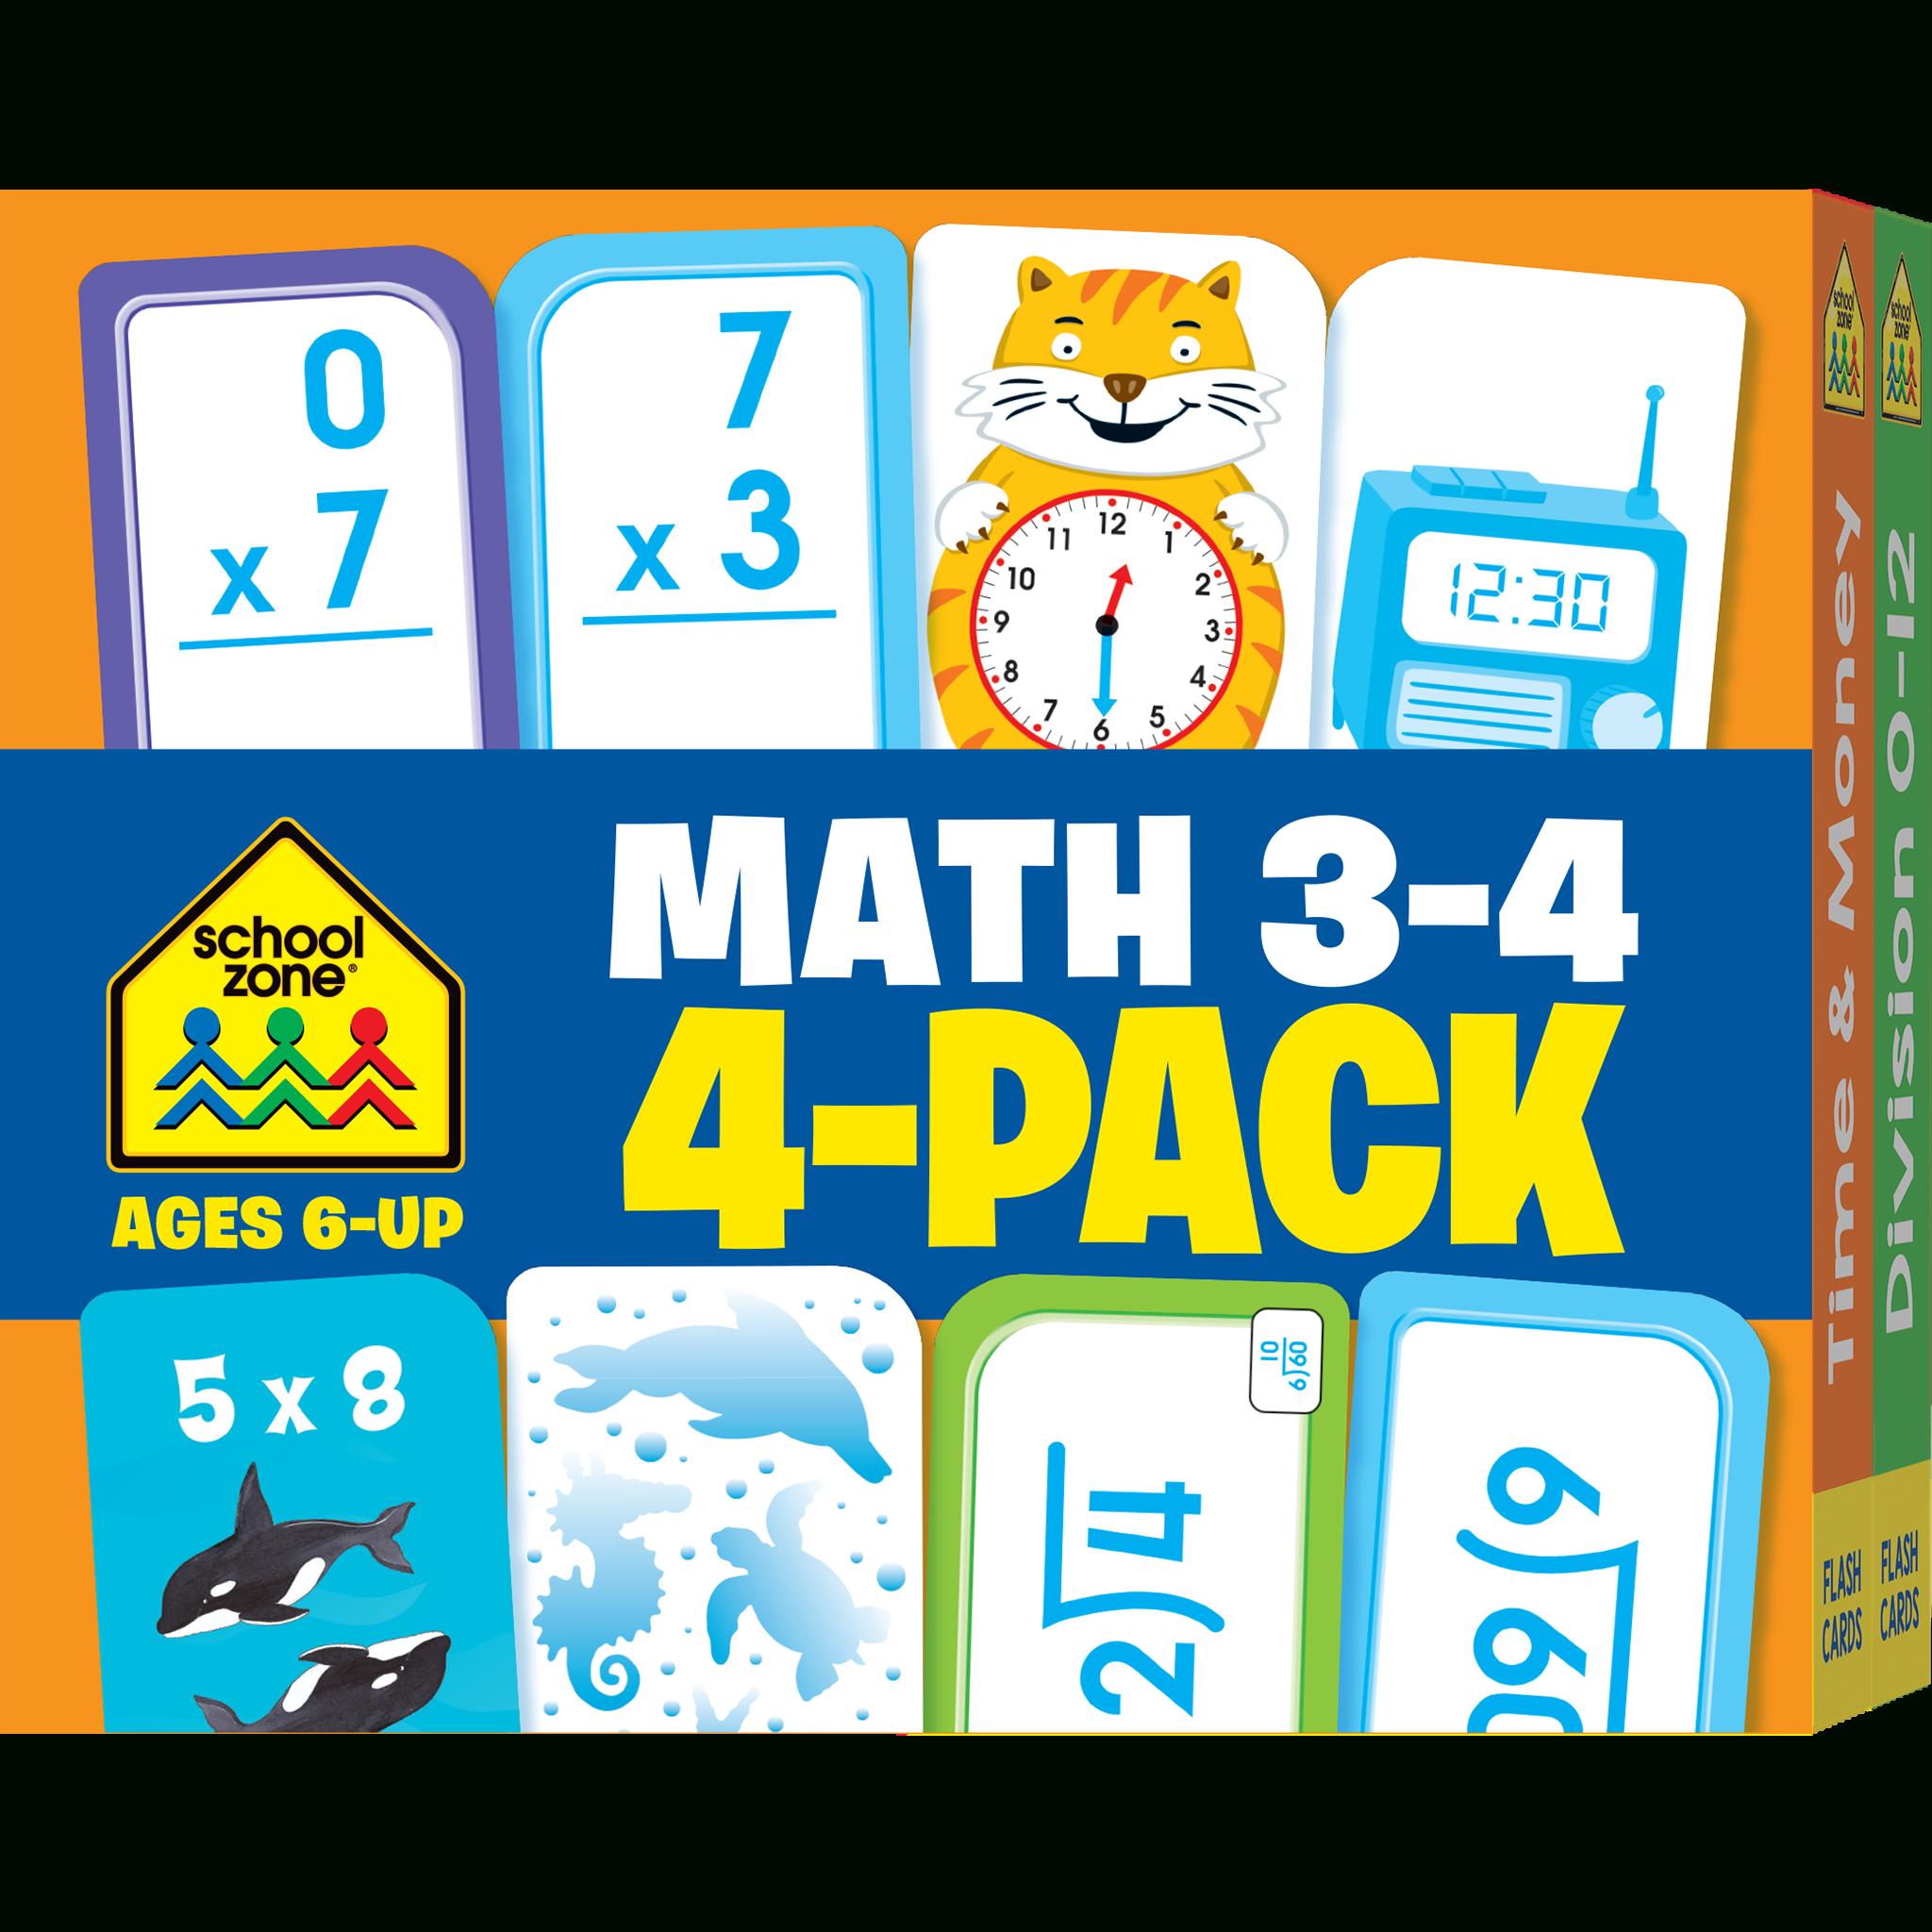 Math Grades 3-4 Flash Cards 4-Pack